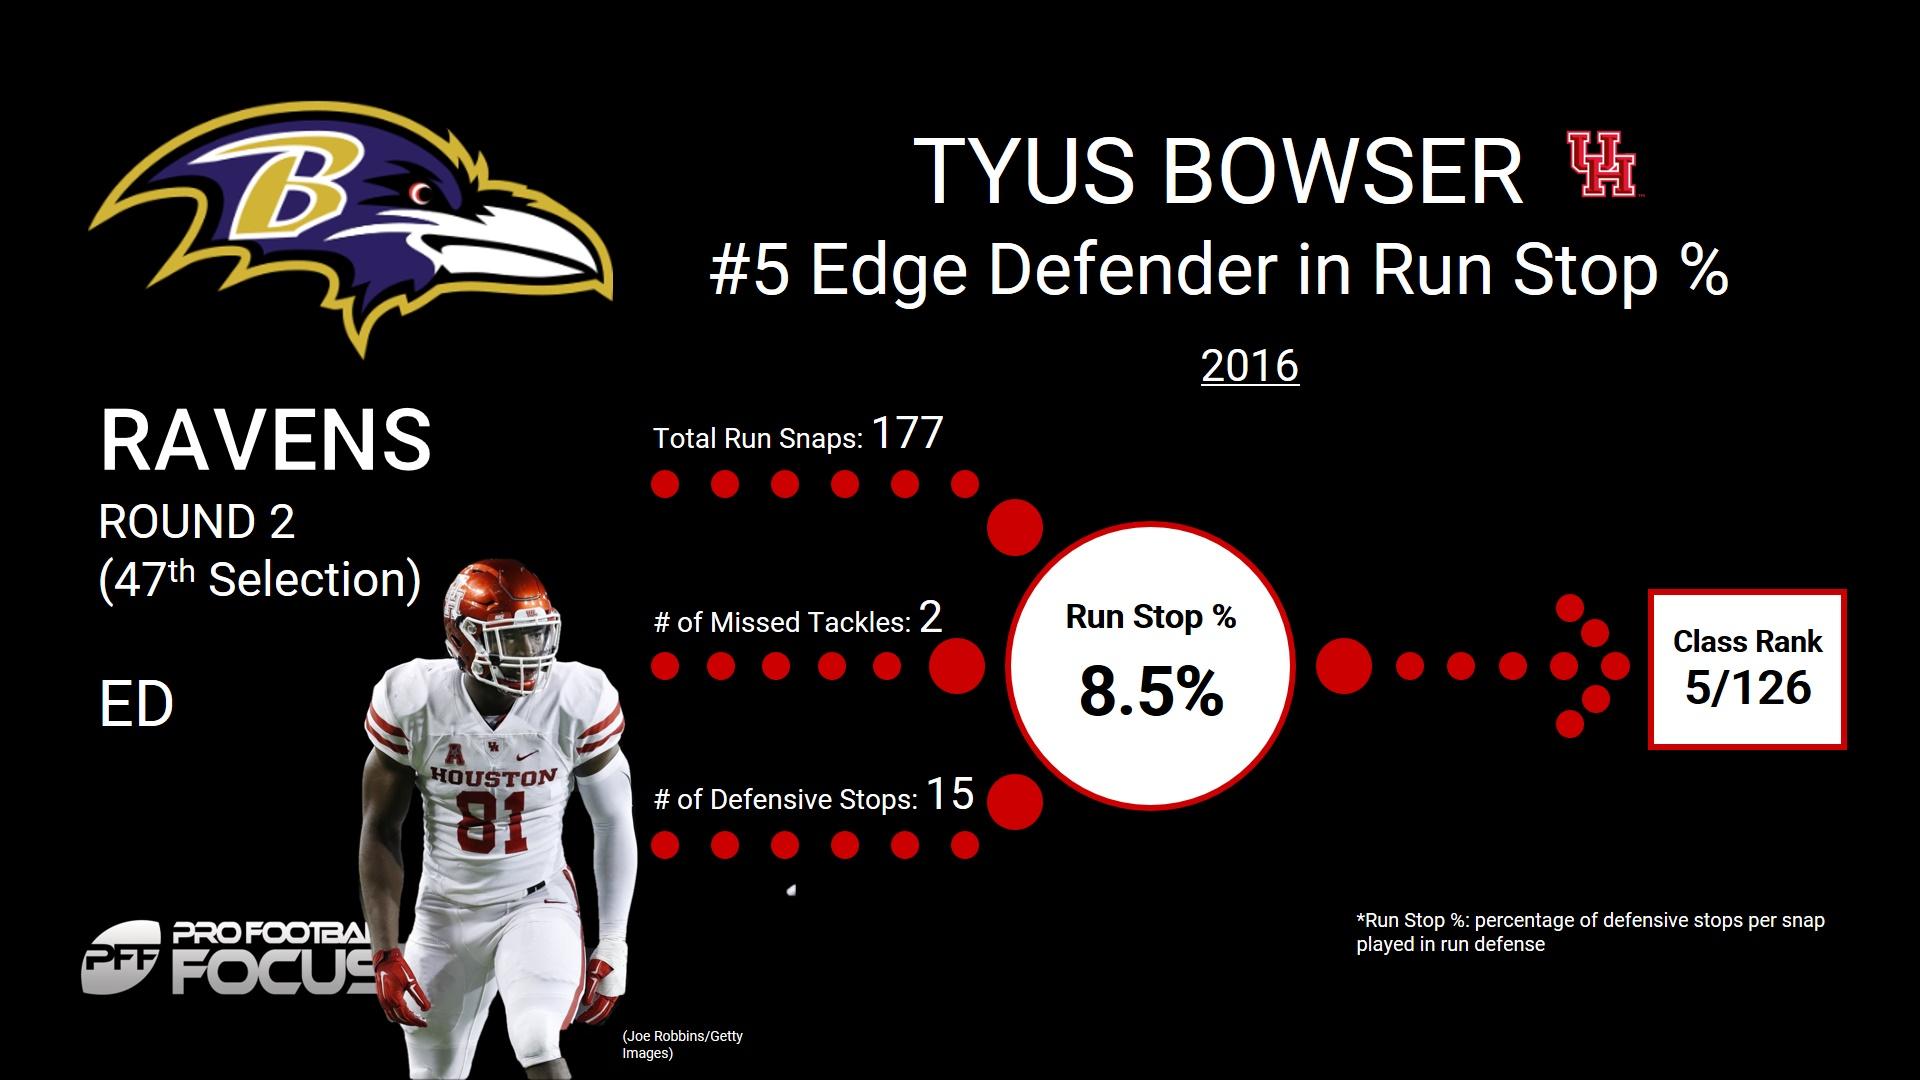 Tyus Bowser